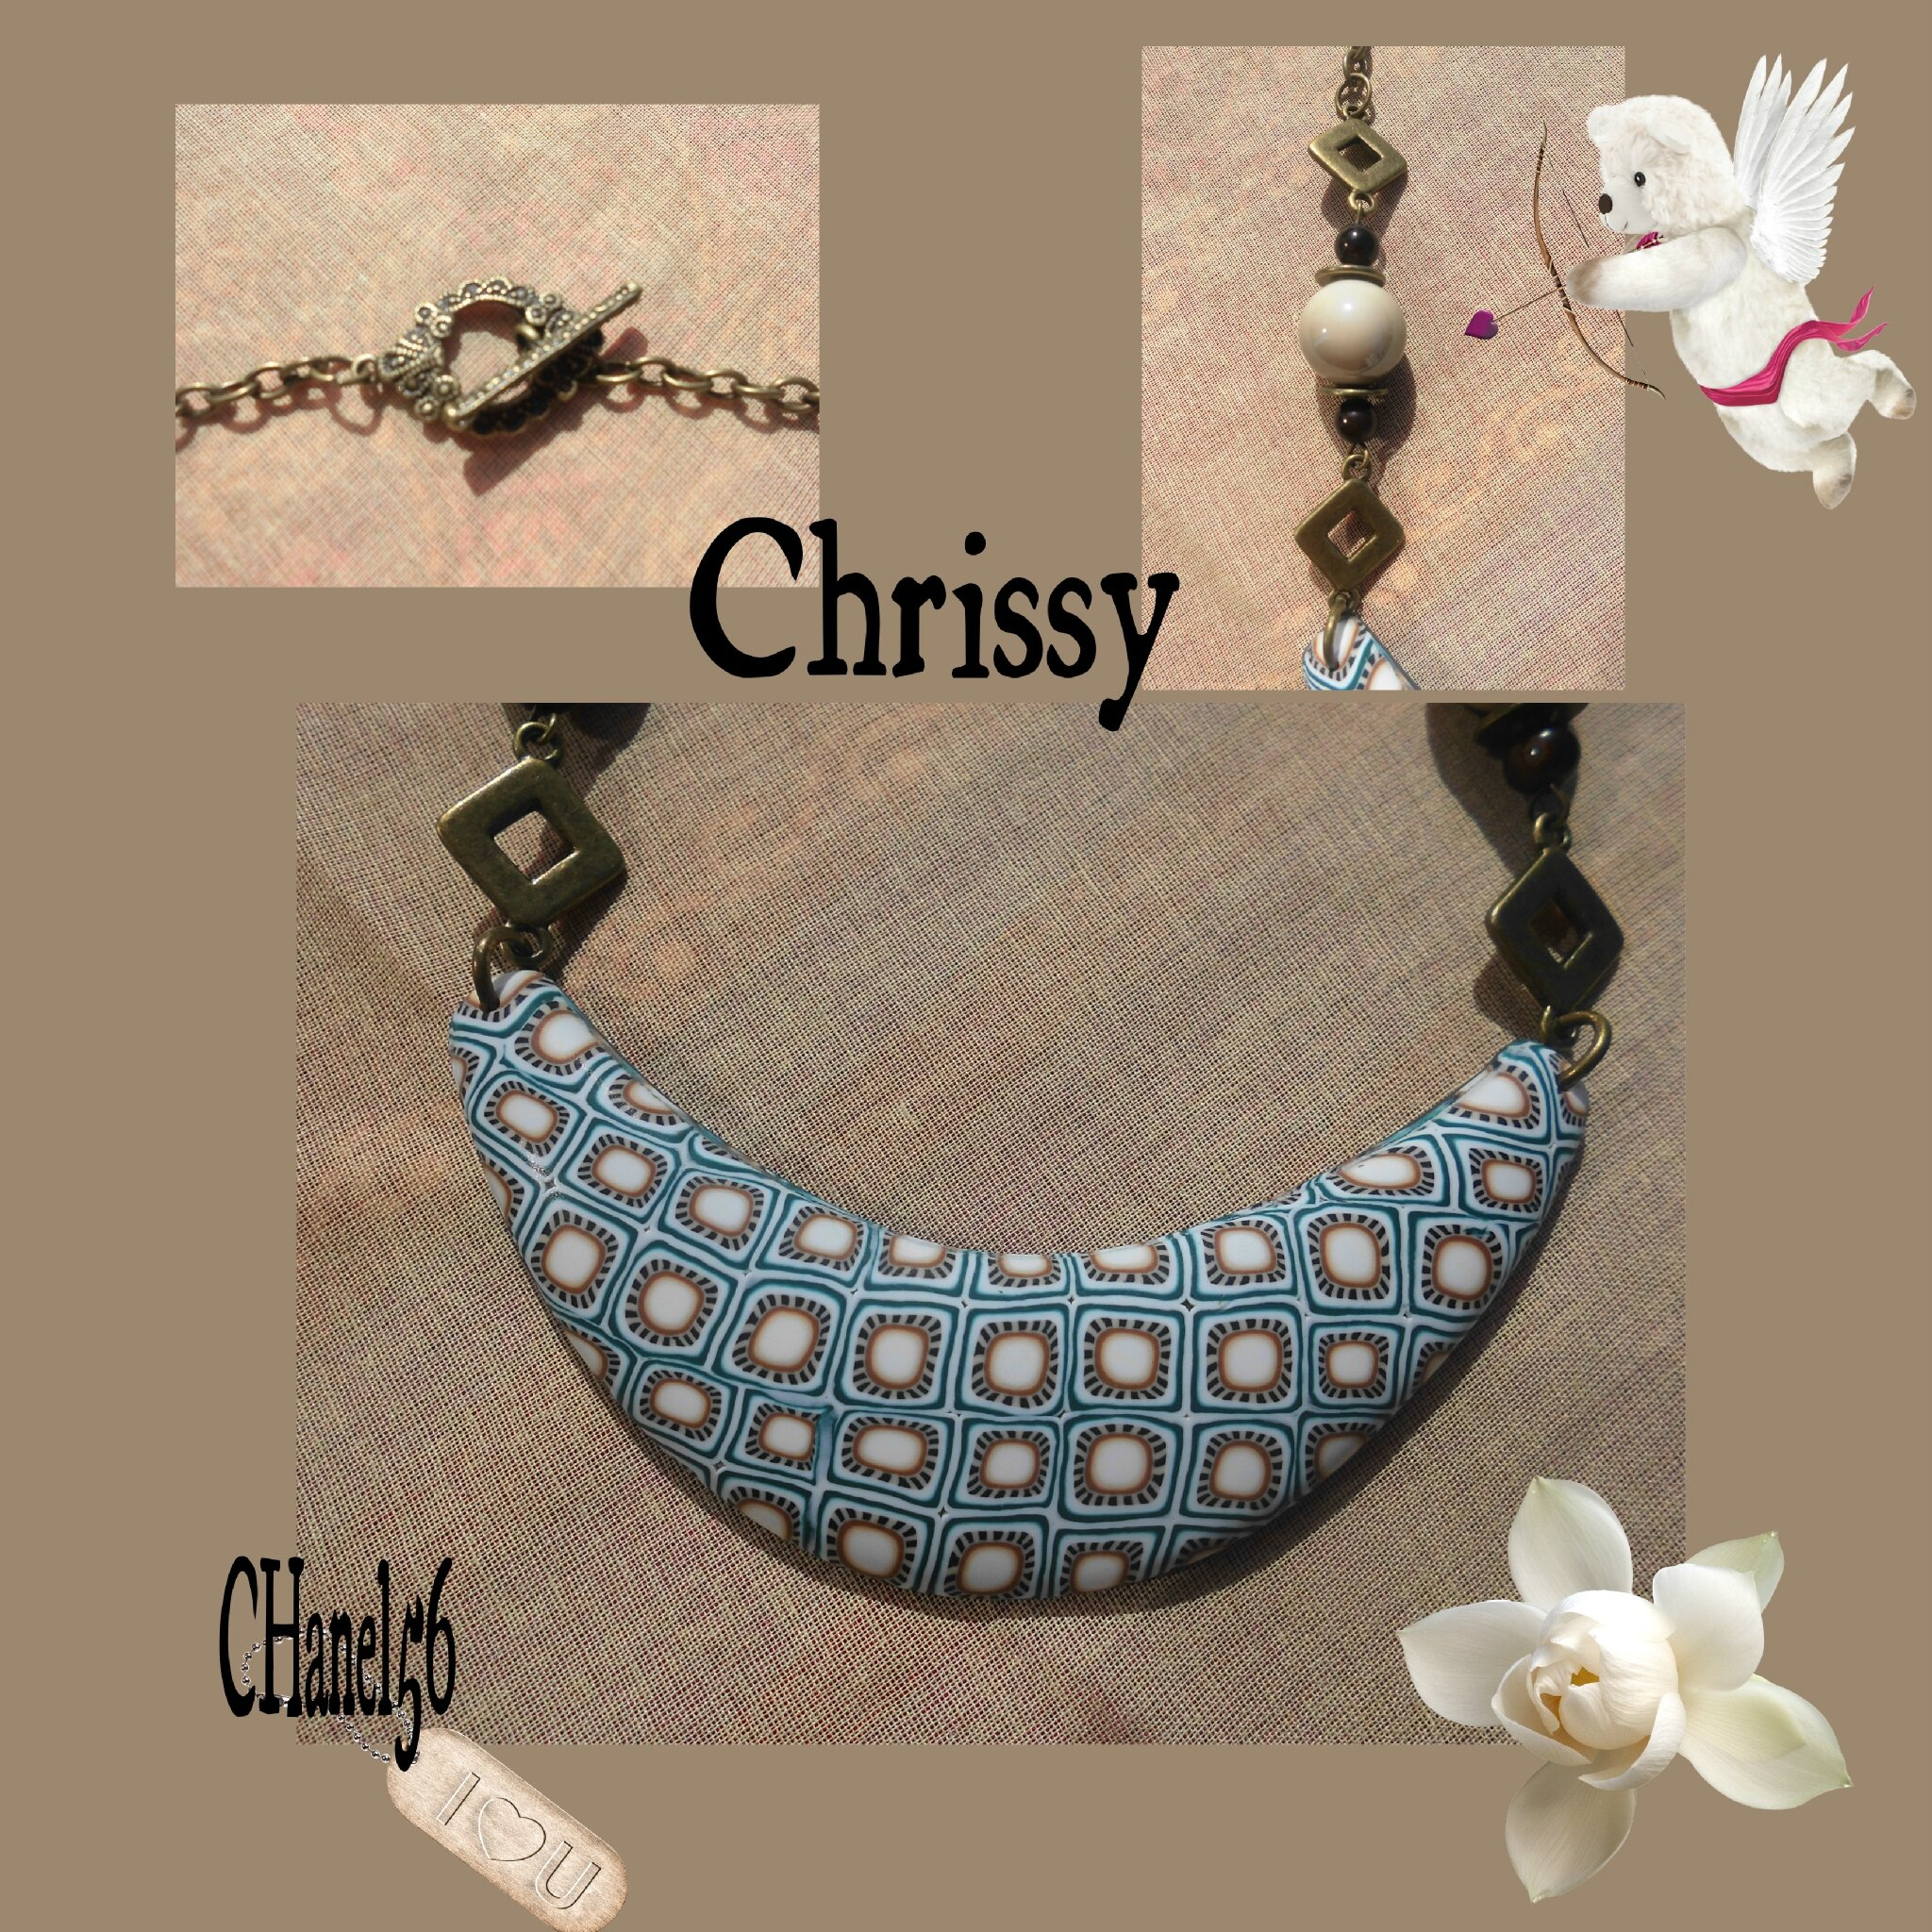 chrissy1